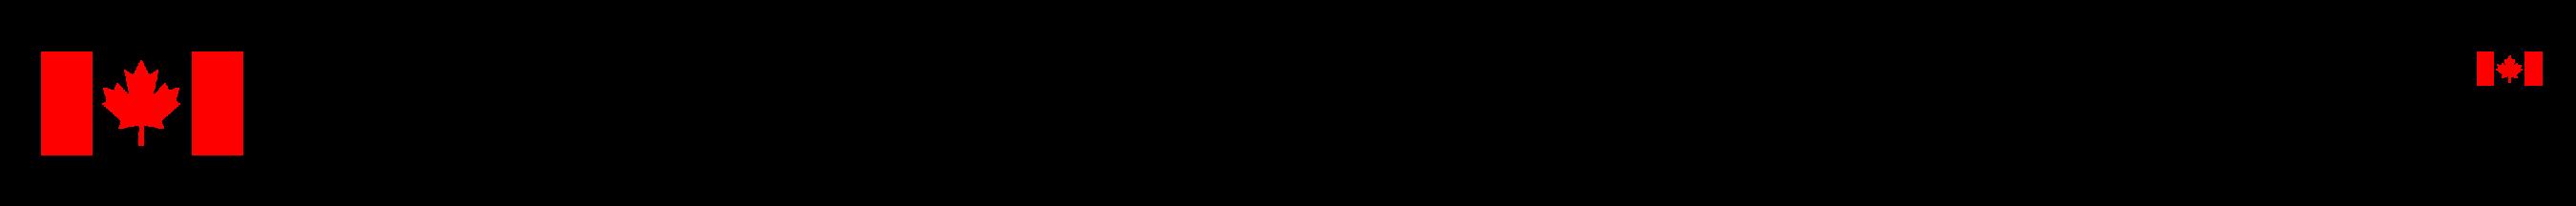 SSHRC logo.